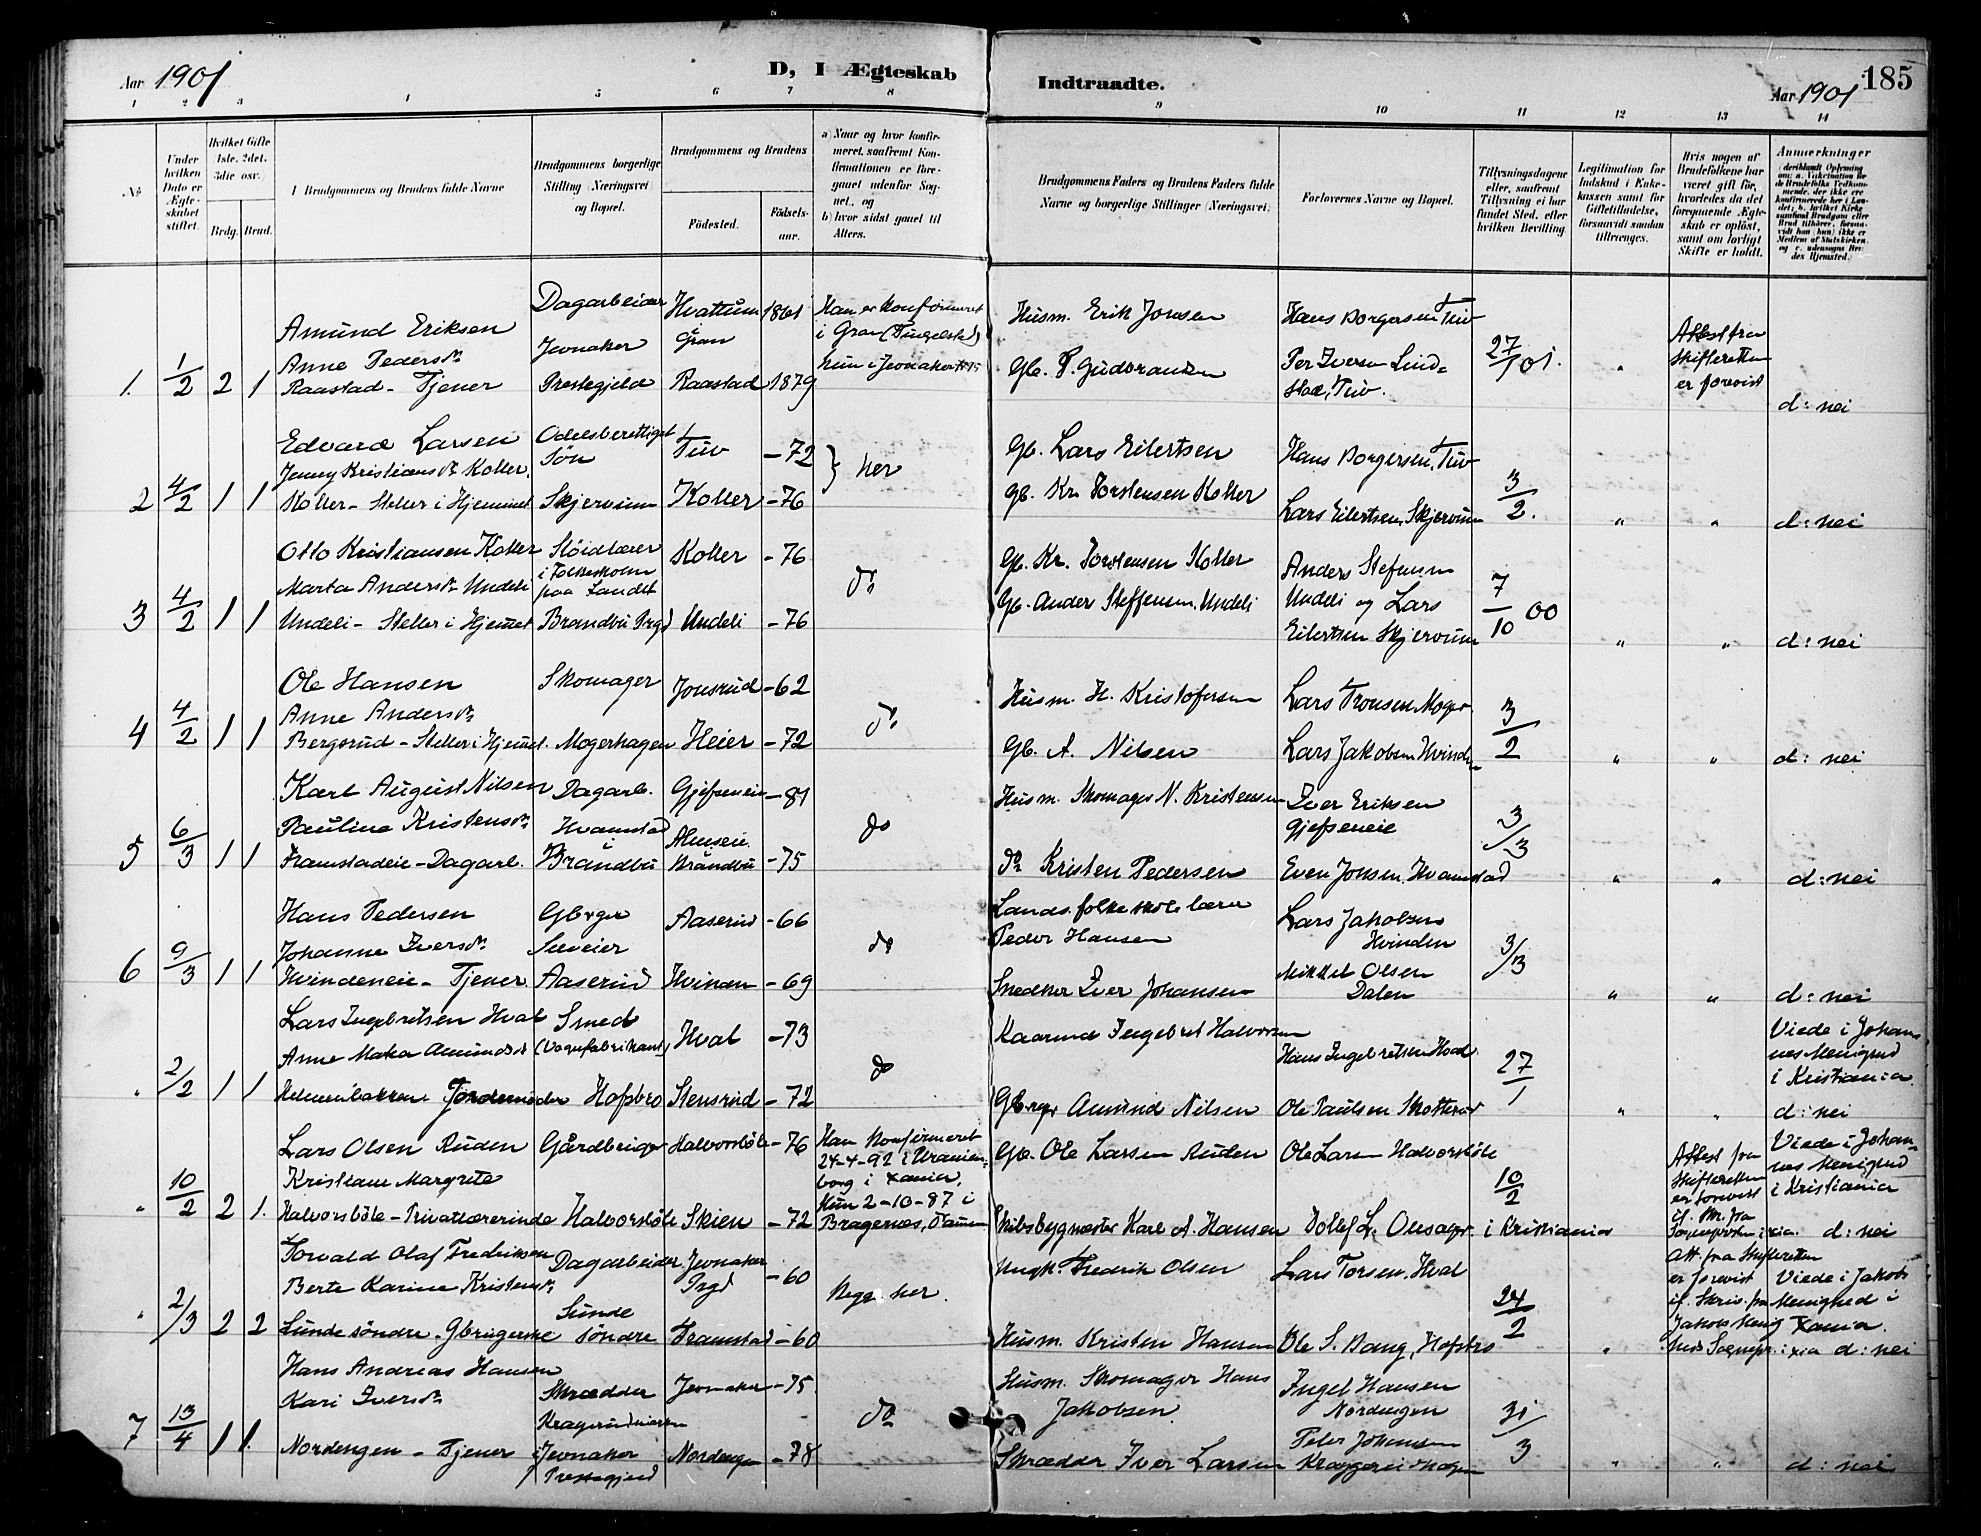 SAH, Gran prestekontor, Ministerialbok nr. 19, 1898-1907, s. 185